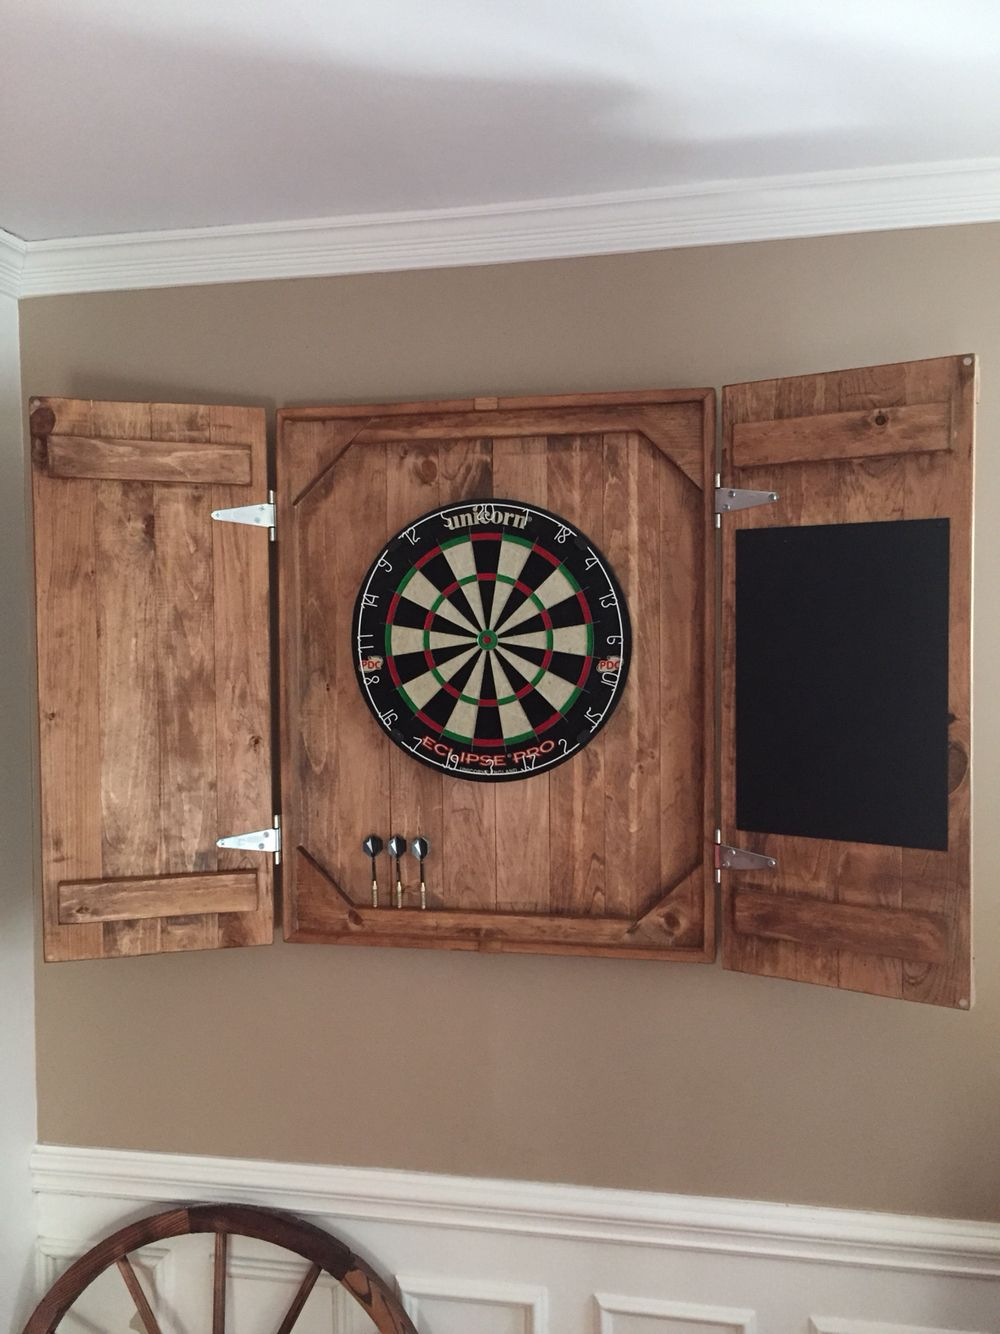 diy dart board case put chalkboard and chalk holder on one side dart holder on other and corks as dart backboard also put a design on wood wood